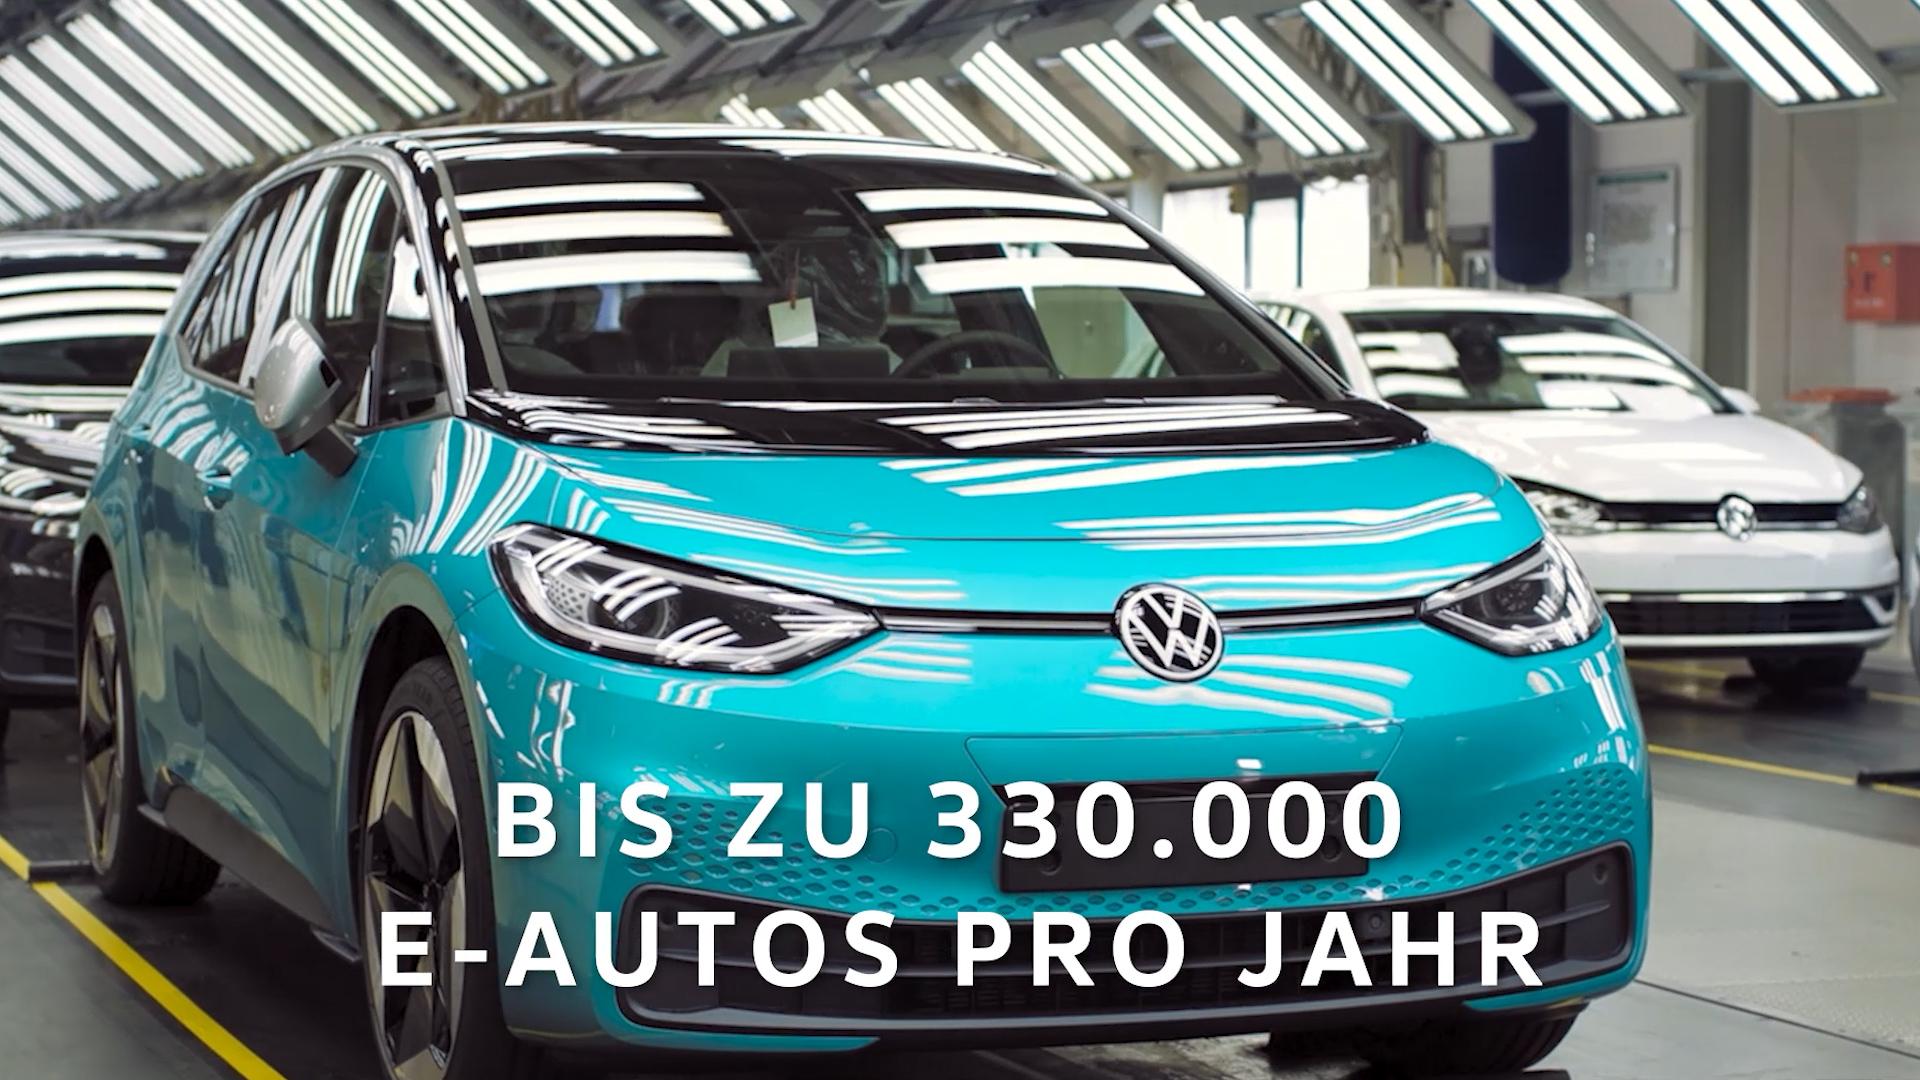 VW jahrsrückblick 2019_05.jpg